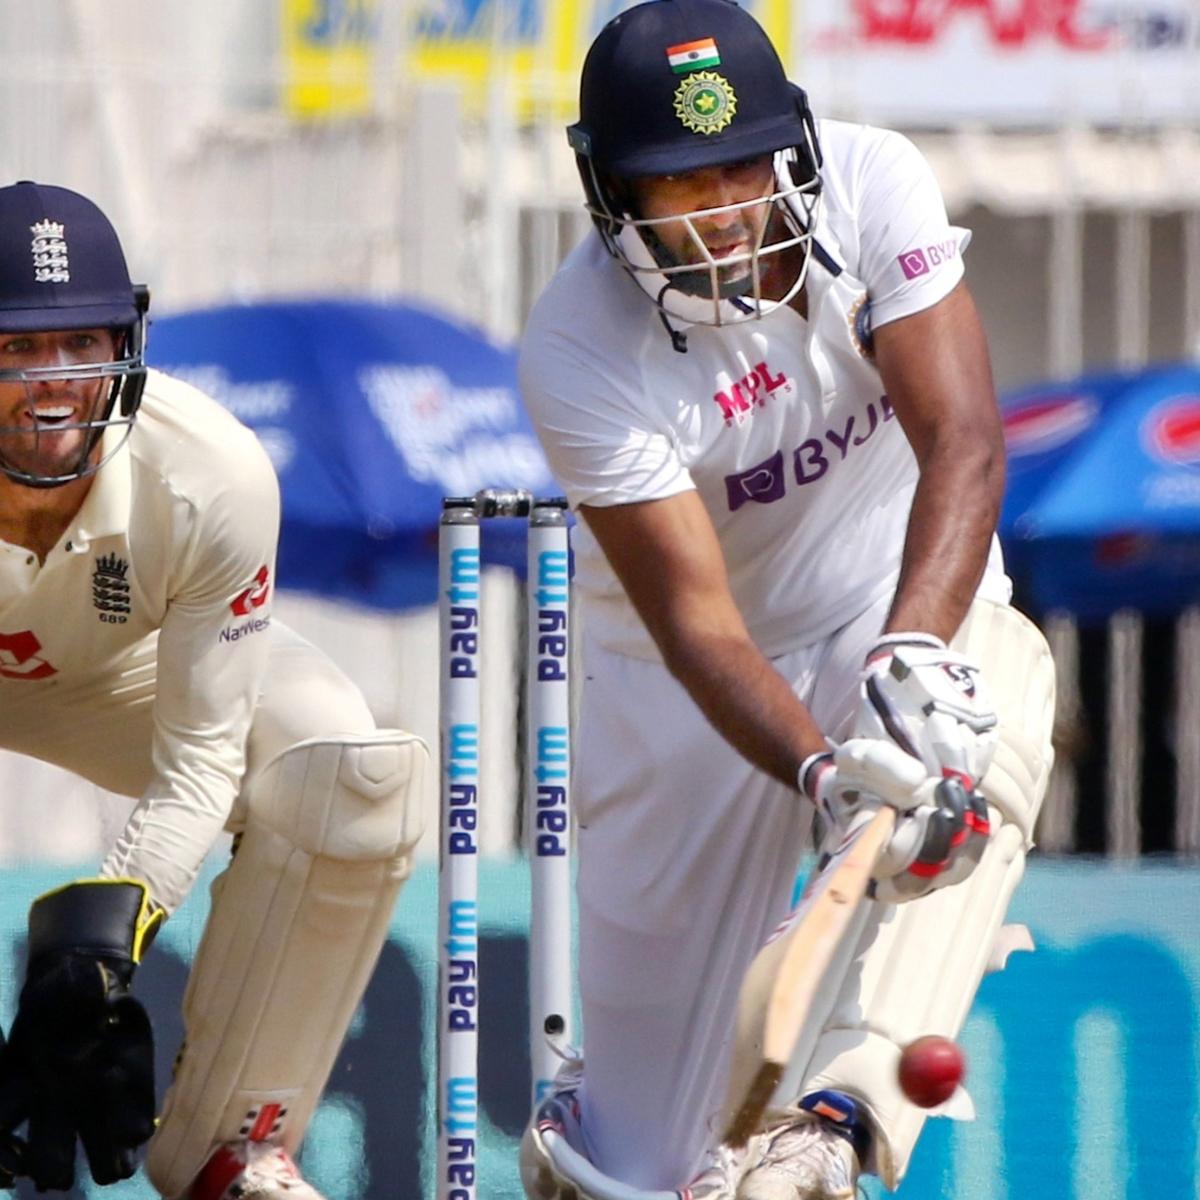 Ind vs Eng, 2nd Test: Mohammad Siraj celebrates R Ashwin's ton